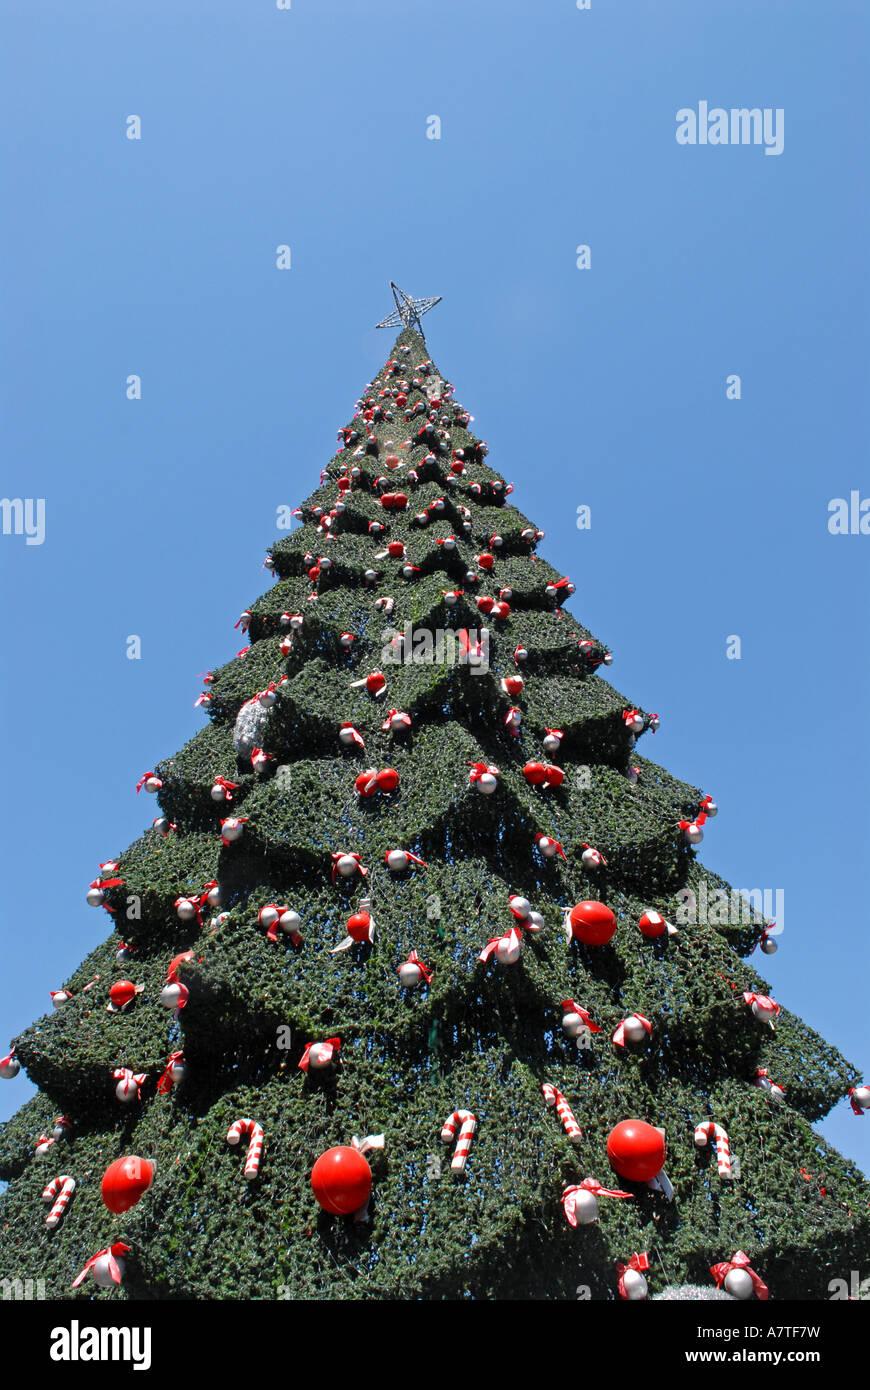 Christmas tree Santiago De Chile Plaza de Armas Stock Photo ...